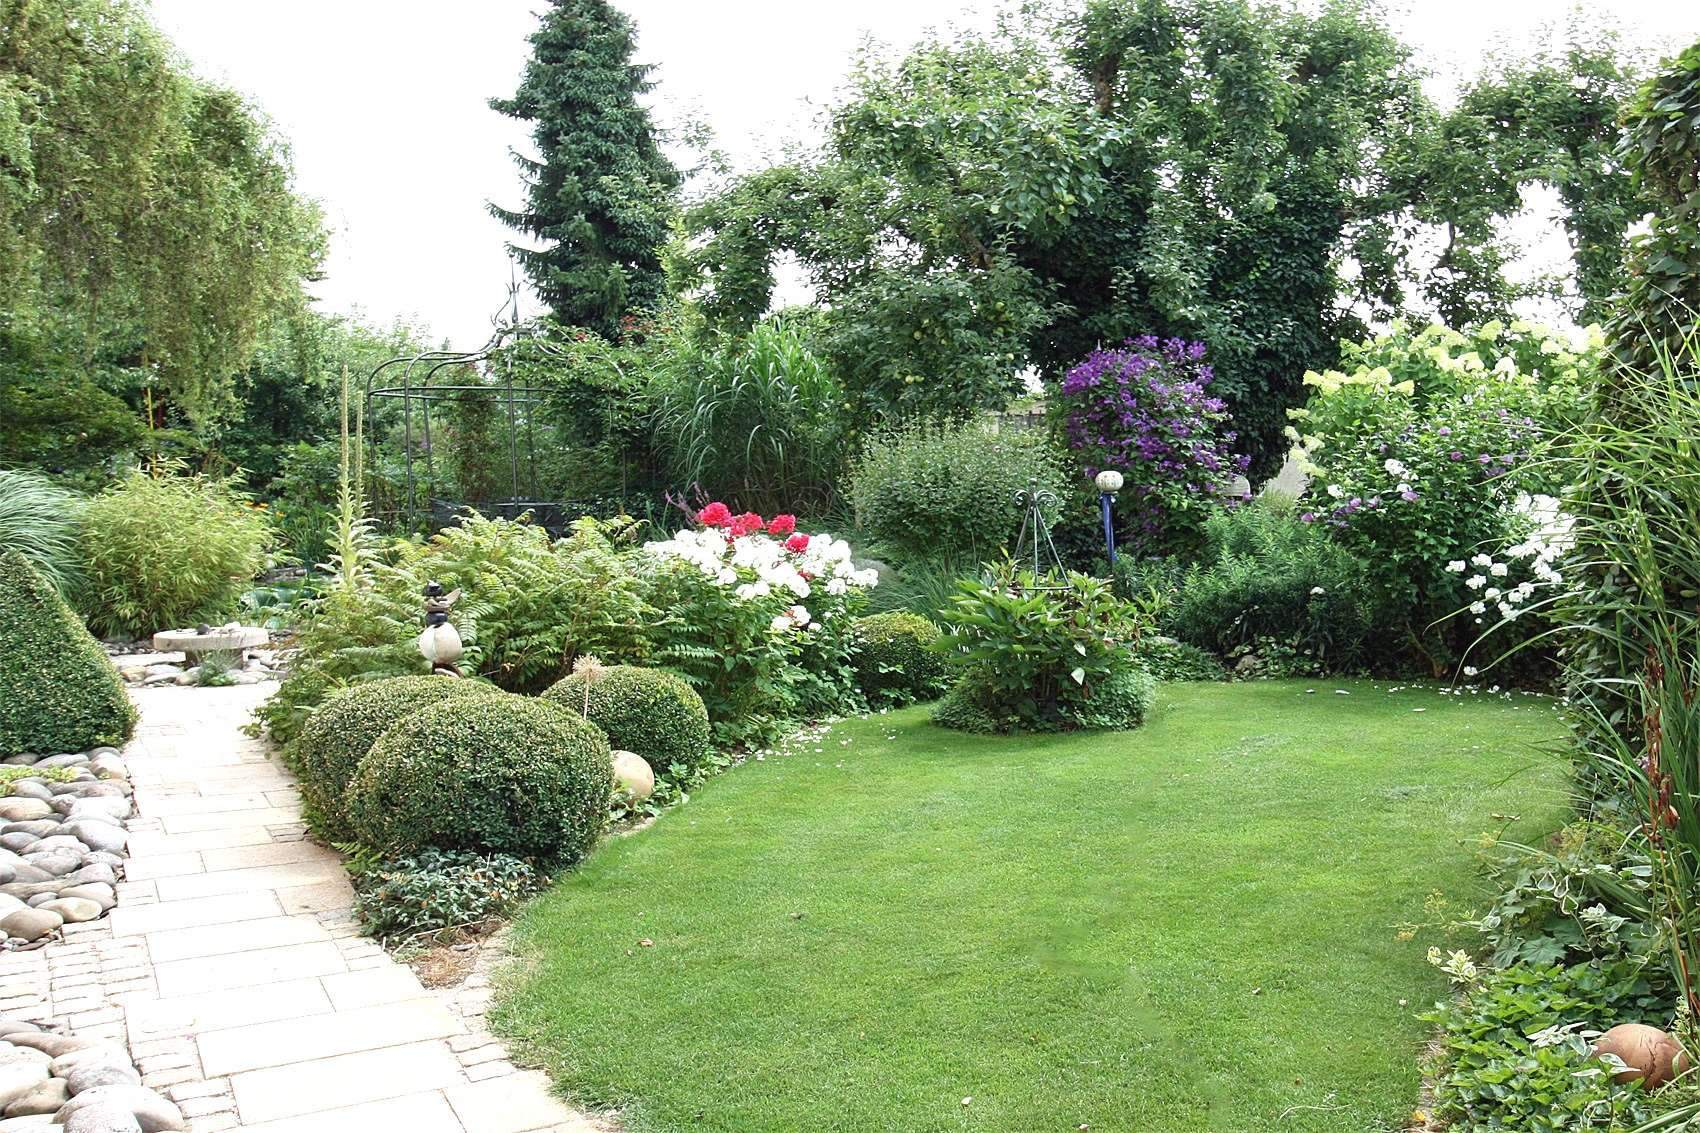 Garten Anlegen Kosten Genial 31 Das Beste Von Garten Anlegen Kosten Luxus